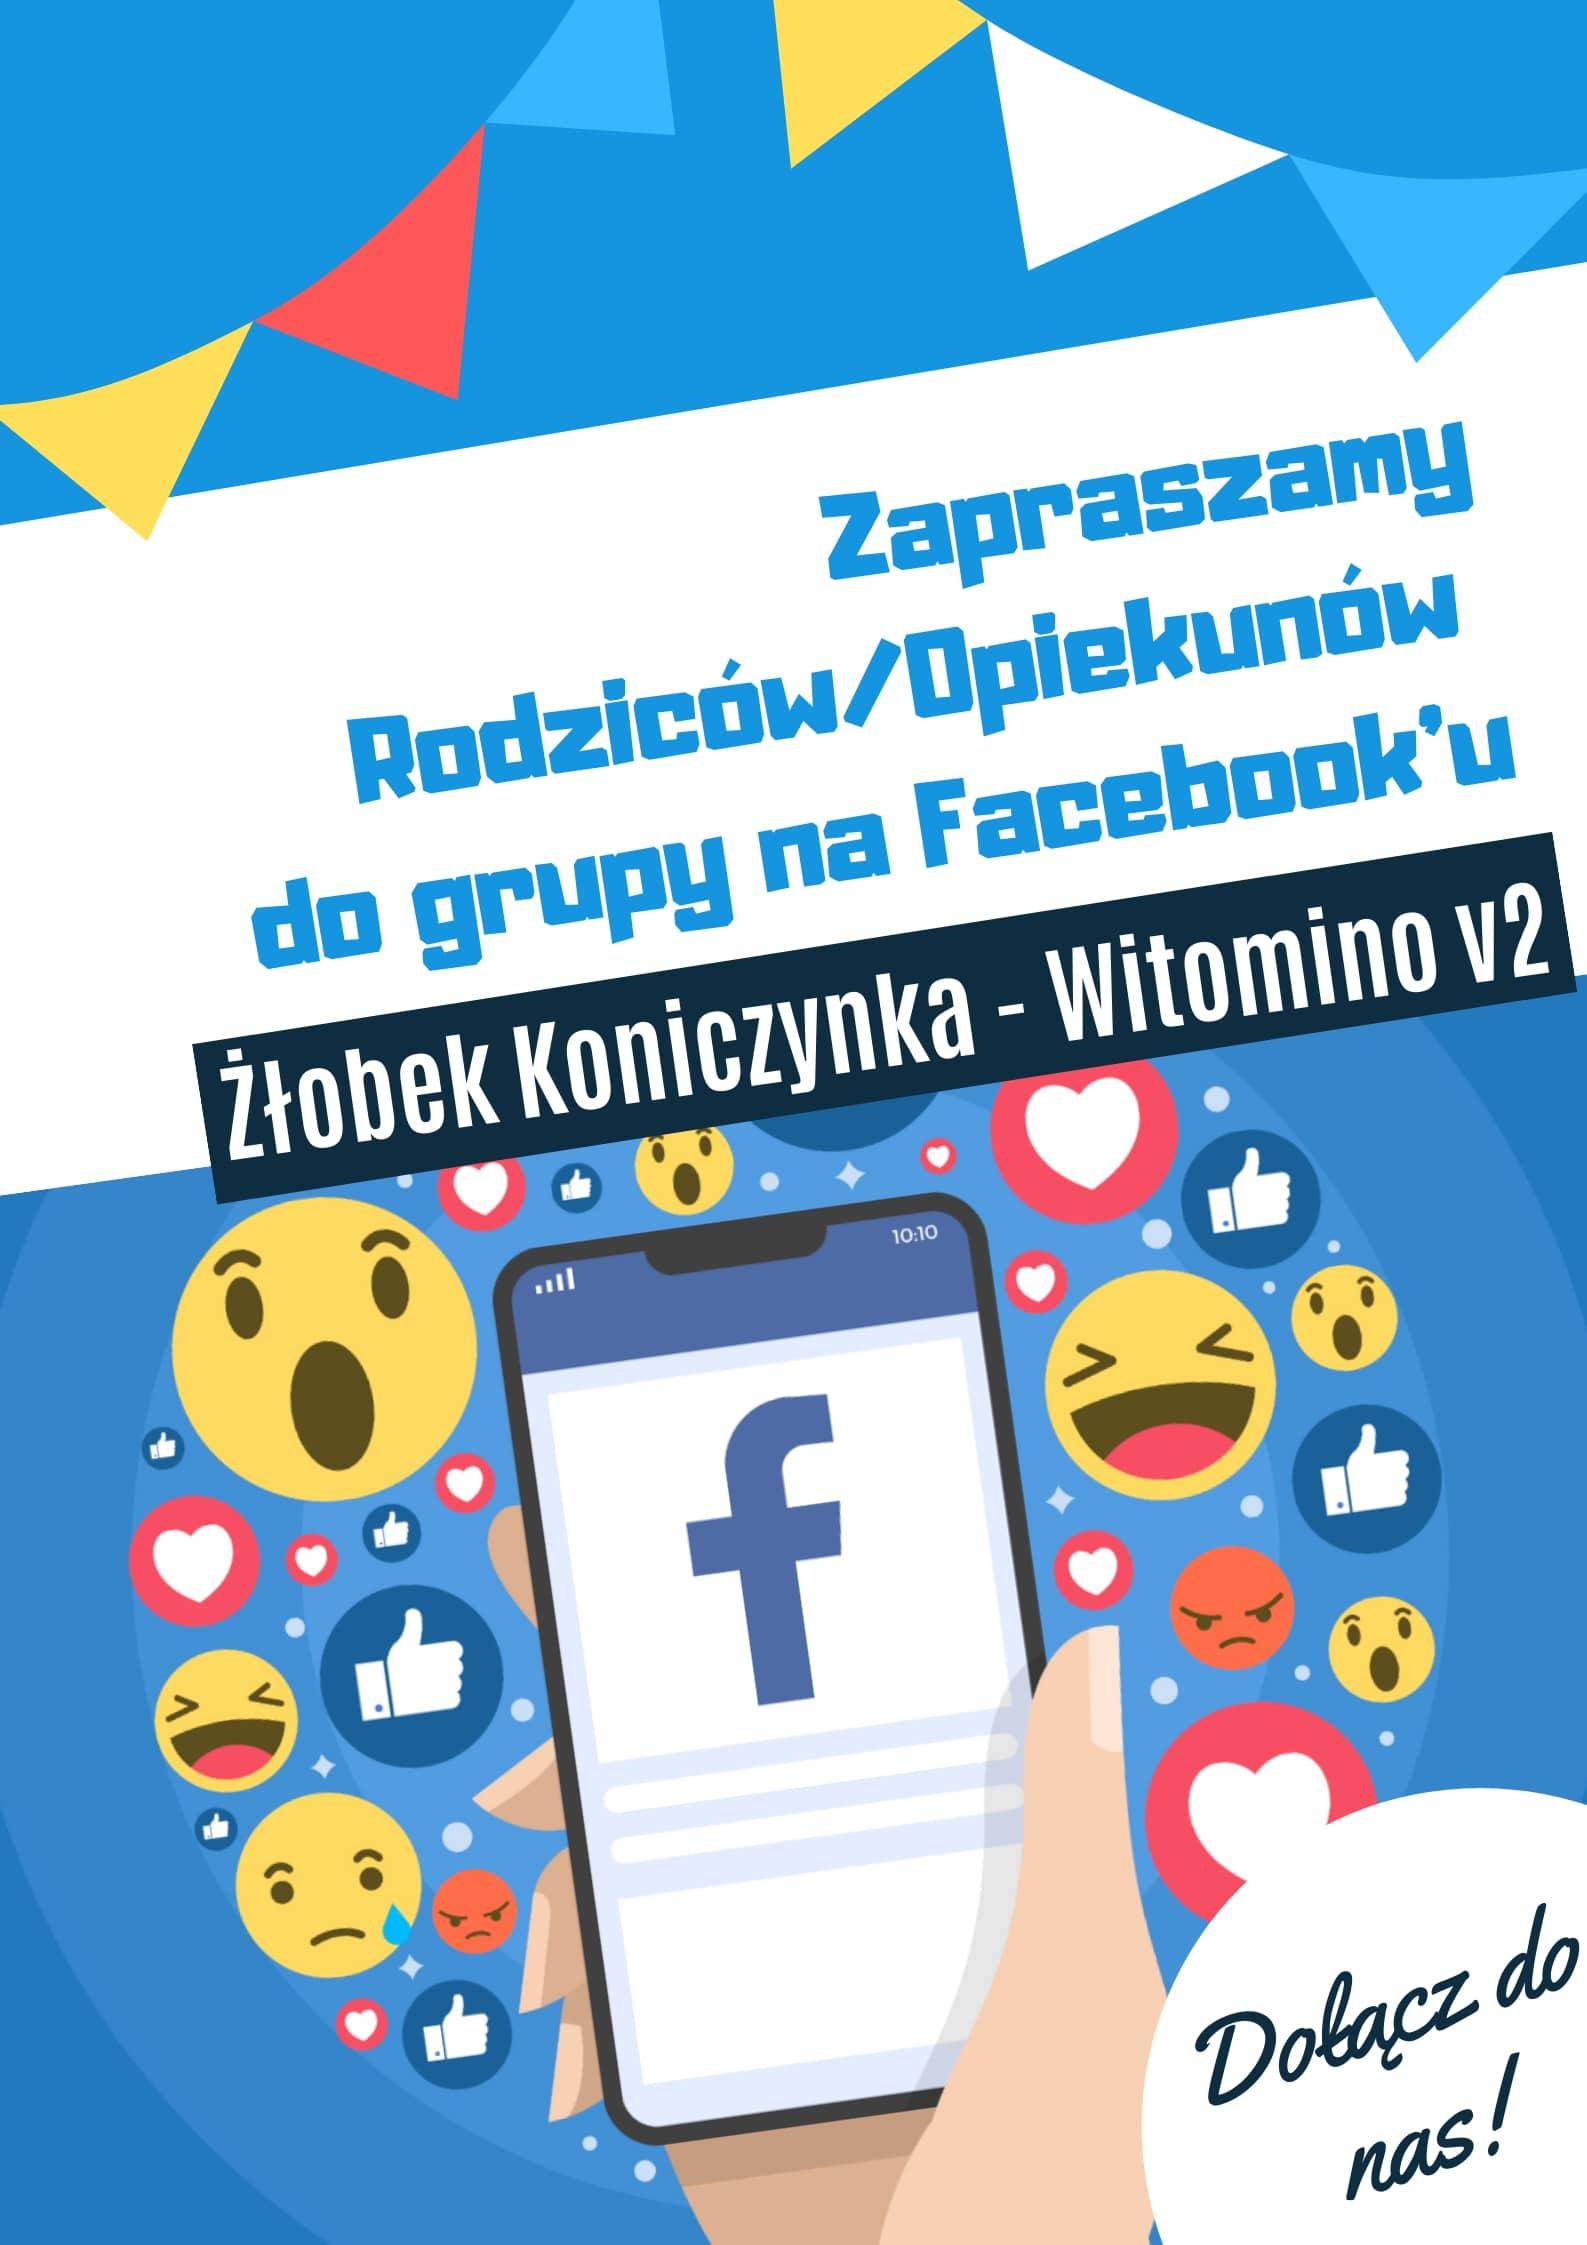 Grupa FB